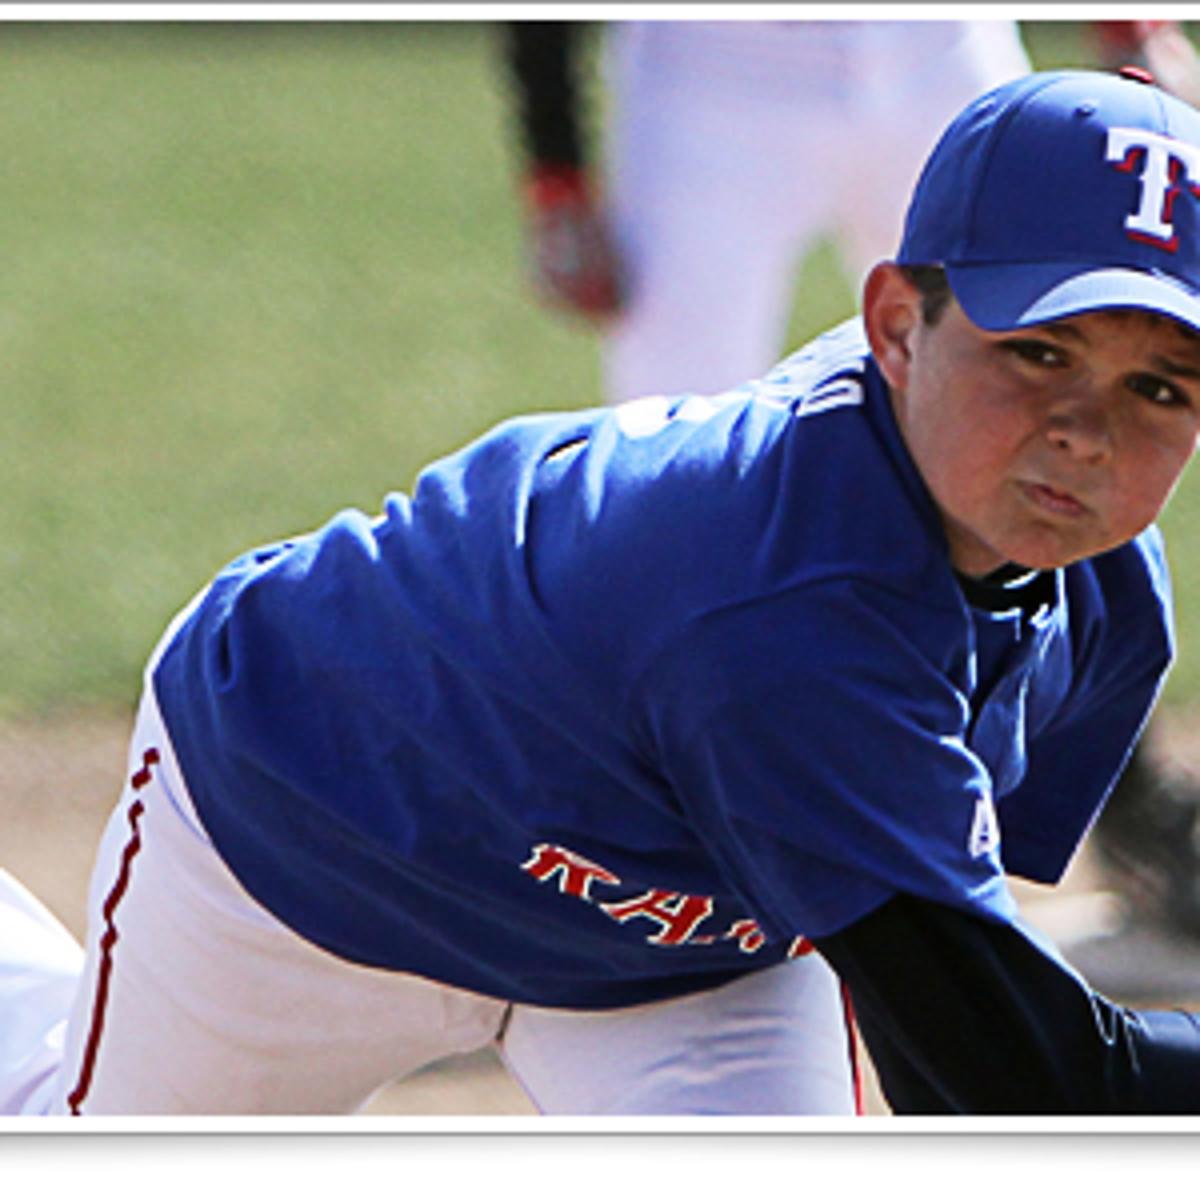 Play Ball Youth Baseball Softball Season Kicks Off In Ellensburg Top Story Dailyrecordnews Com